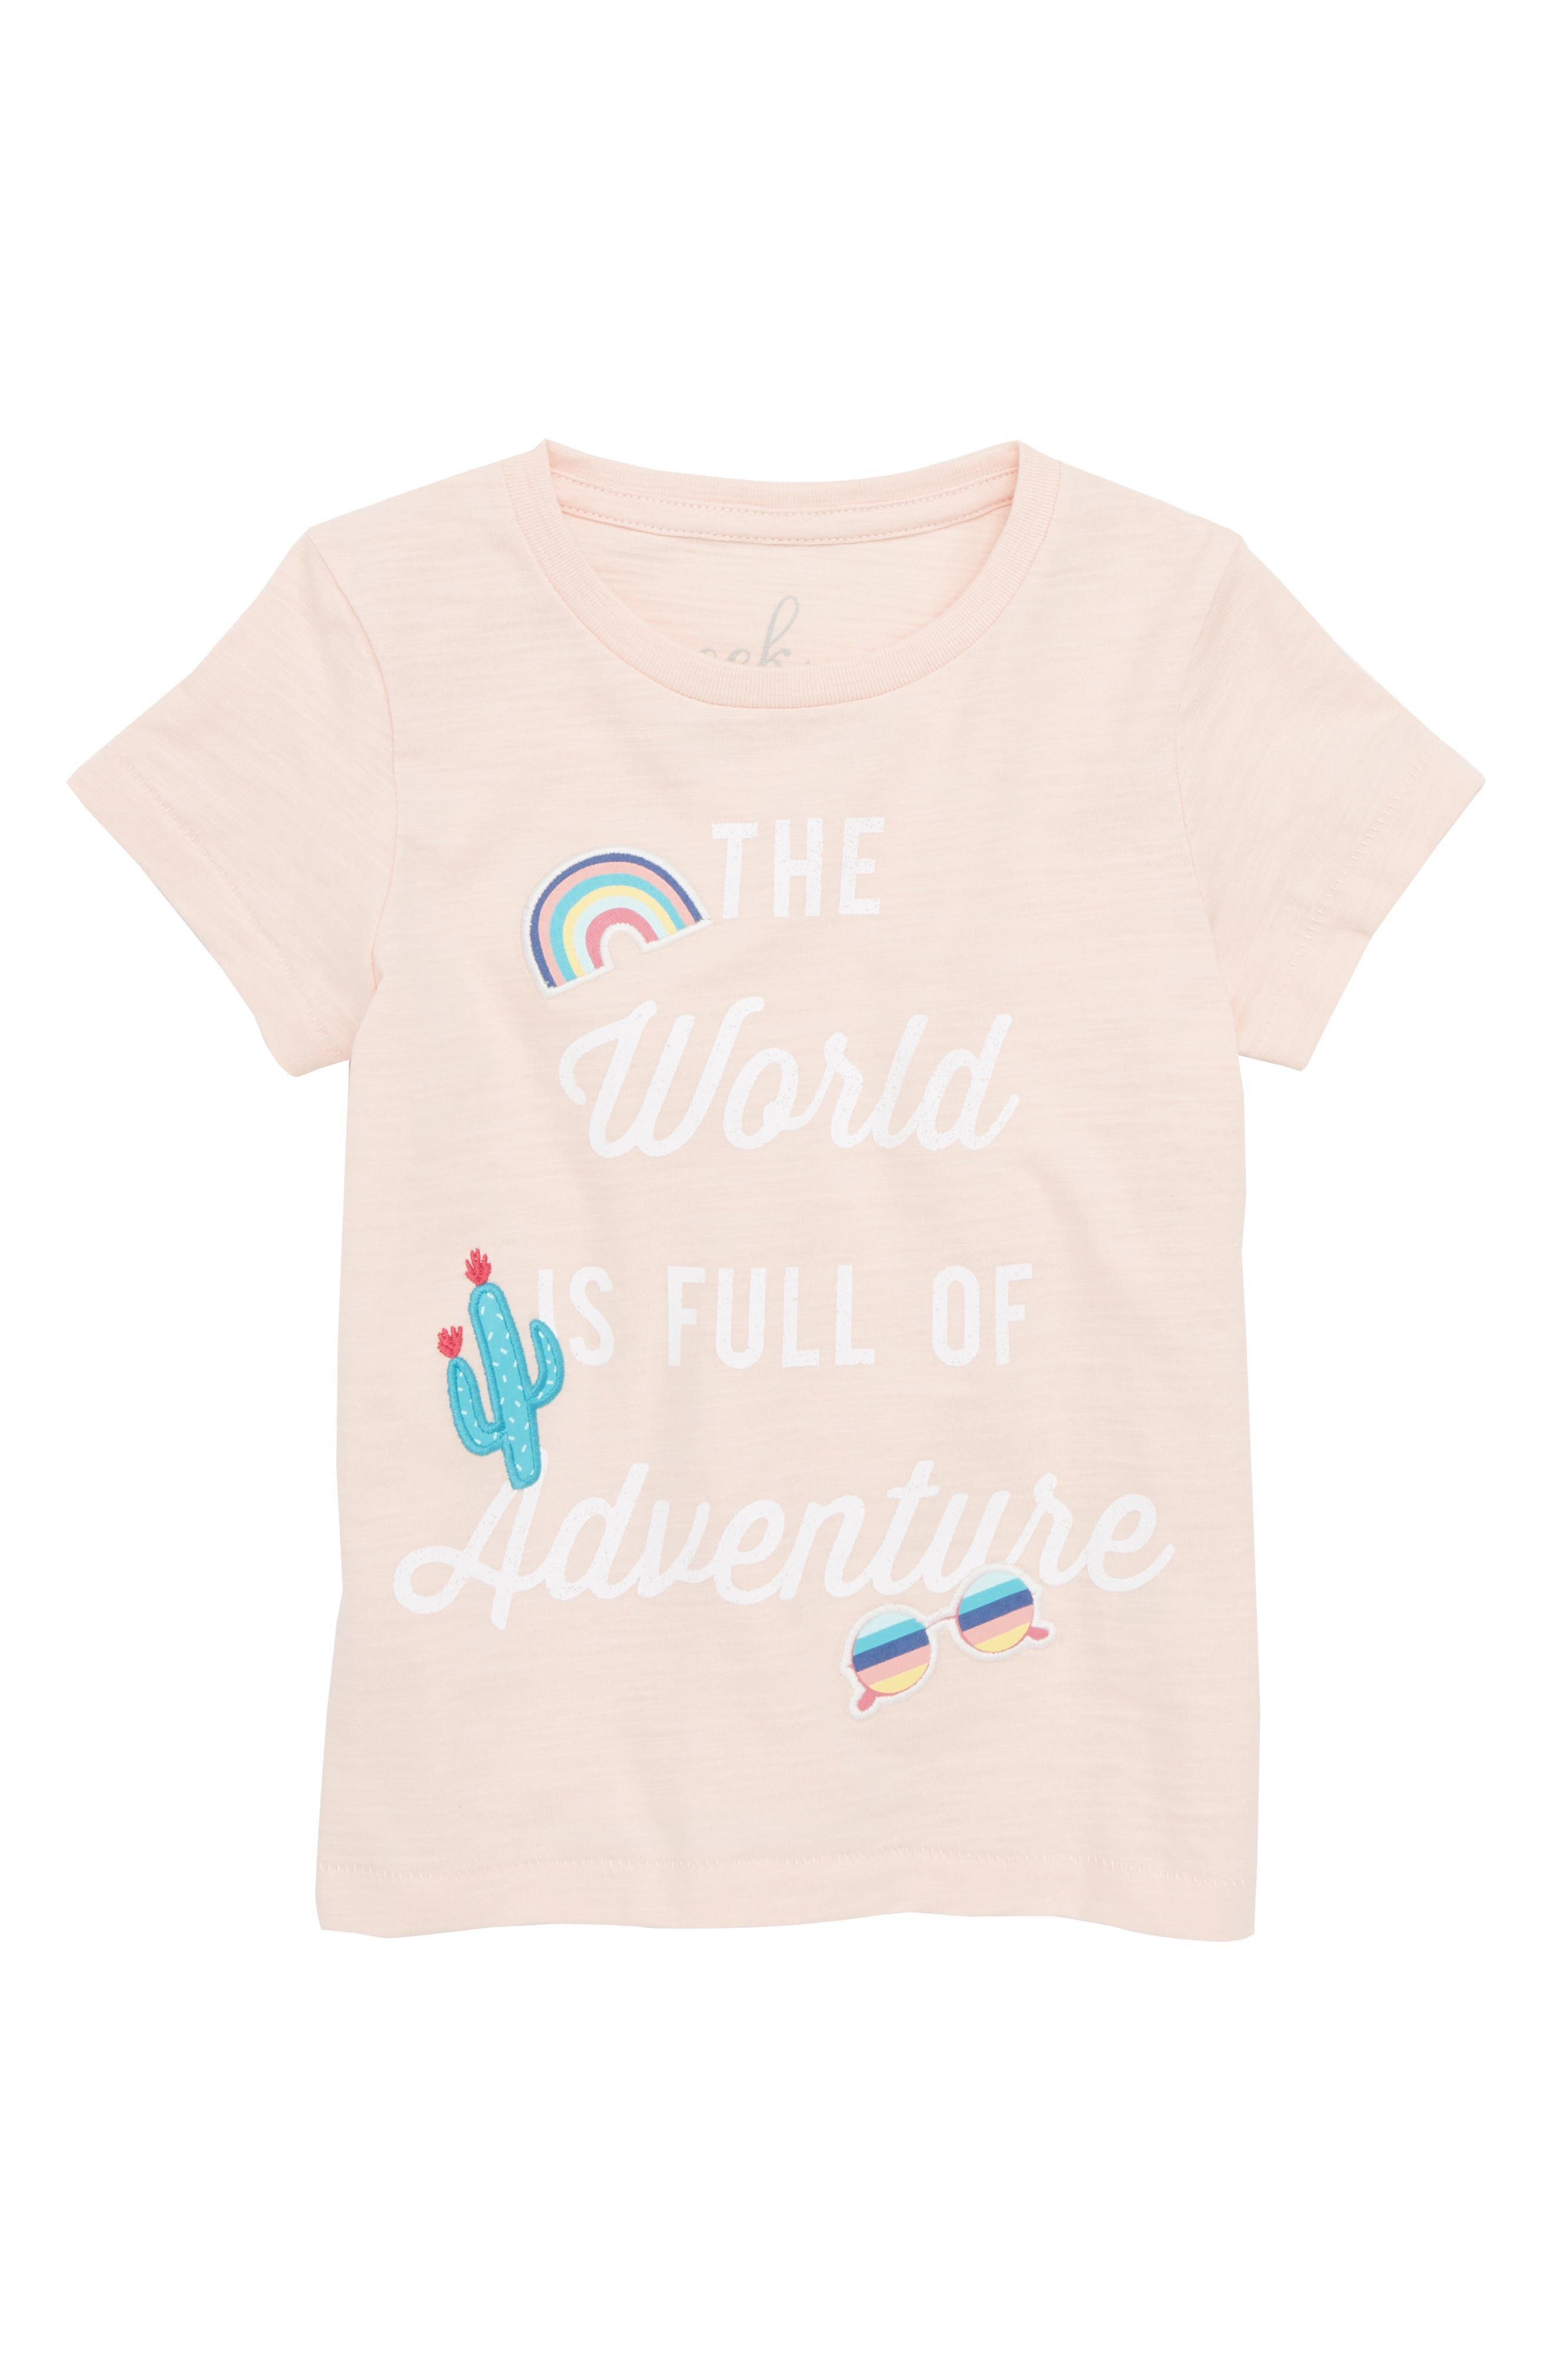 Peek Full of Adventure Graphic Tee (Toddler Girls, Little Girls & Big Girls)